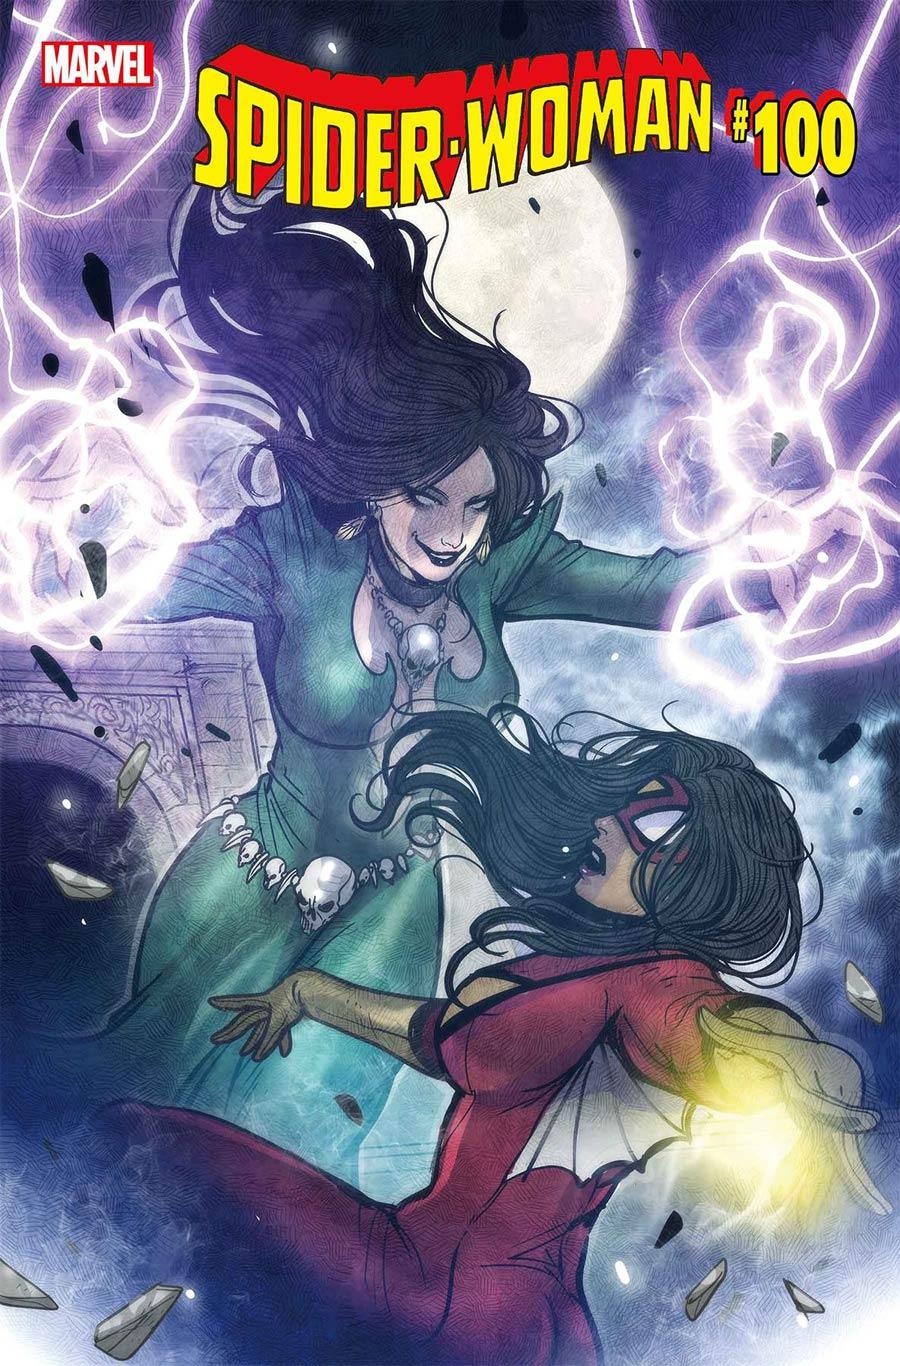 Spider-Woman Vol 7 #5 Cover E Variant Sana Takeda Villain Cover (#100)